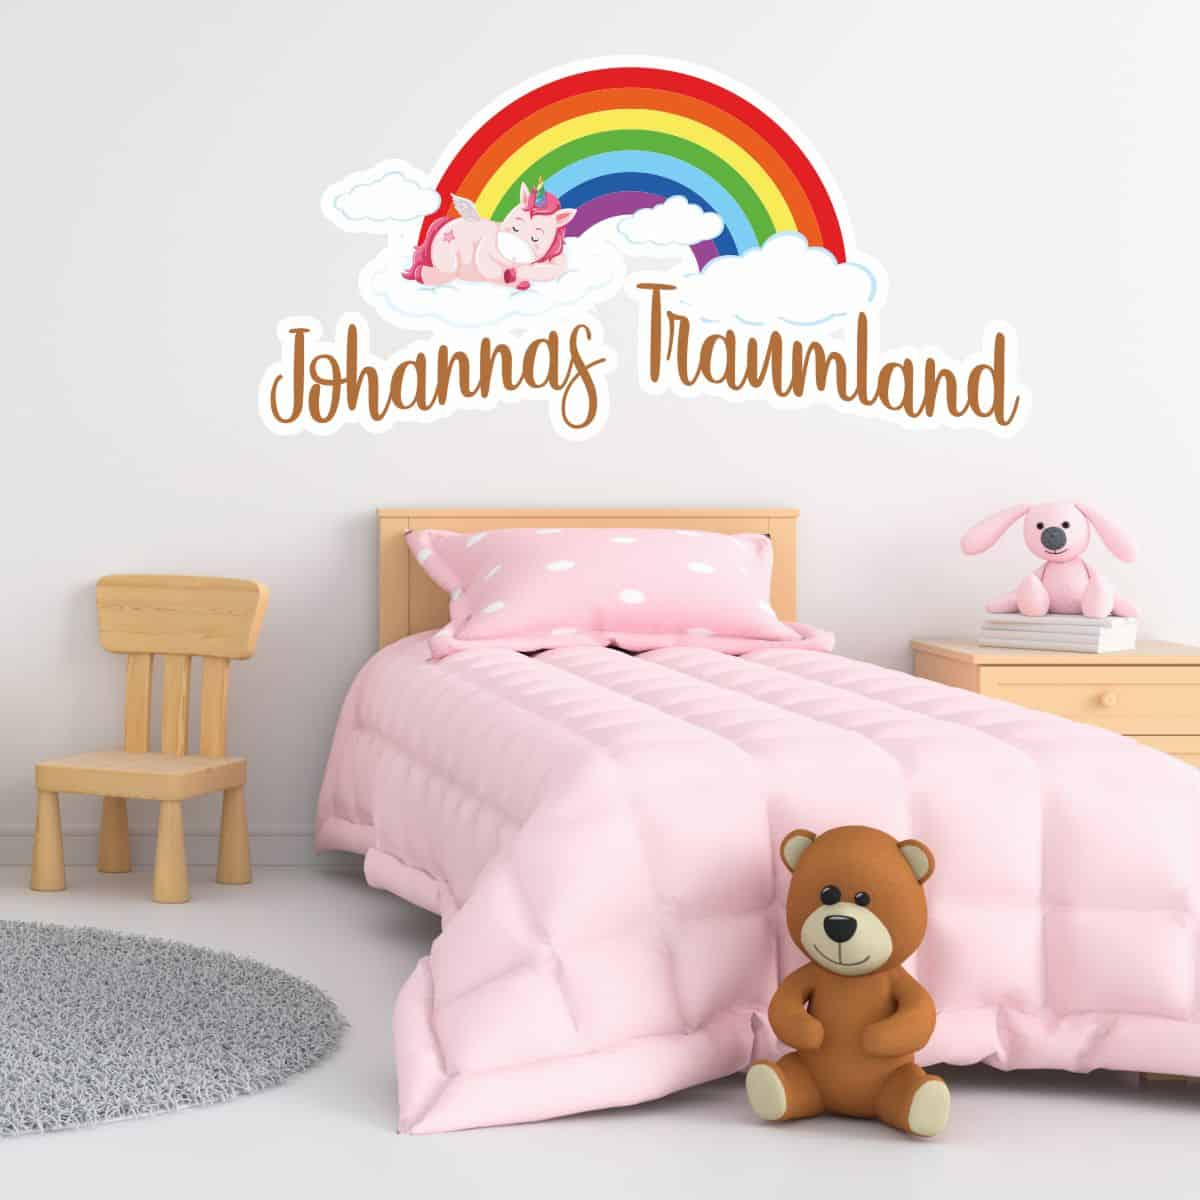 Kinderzimme Traumland